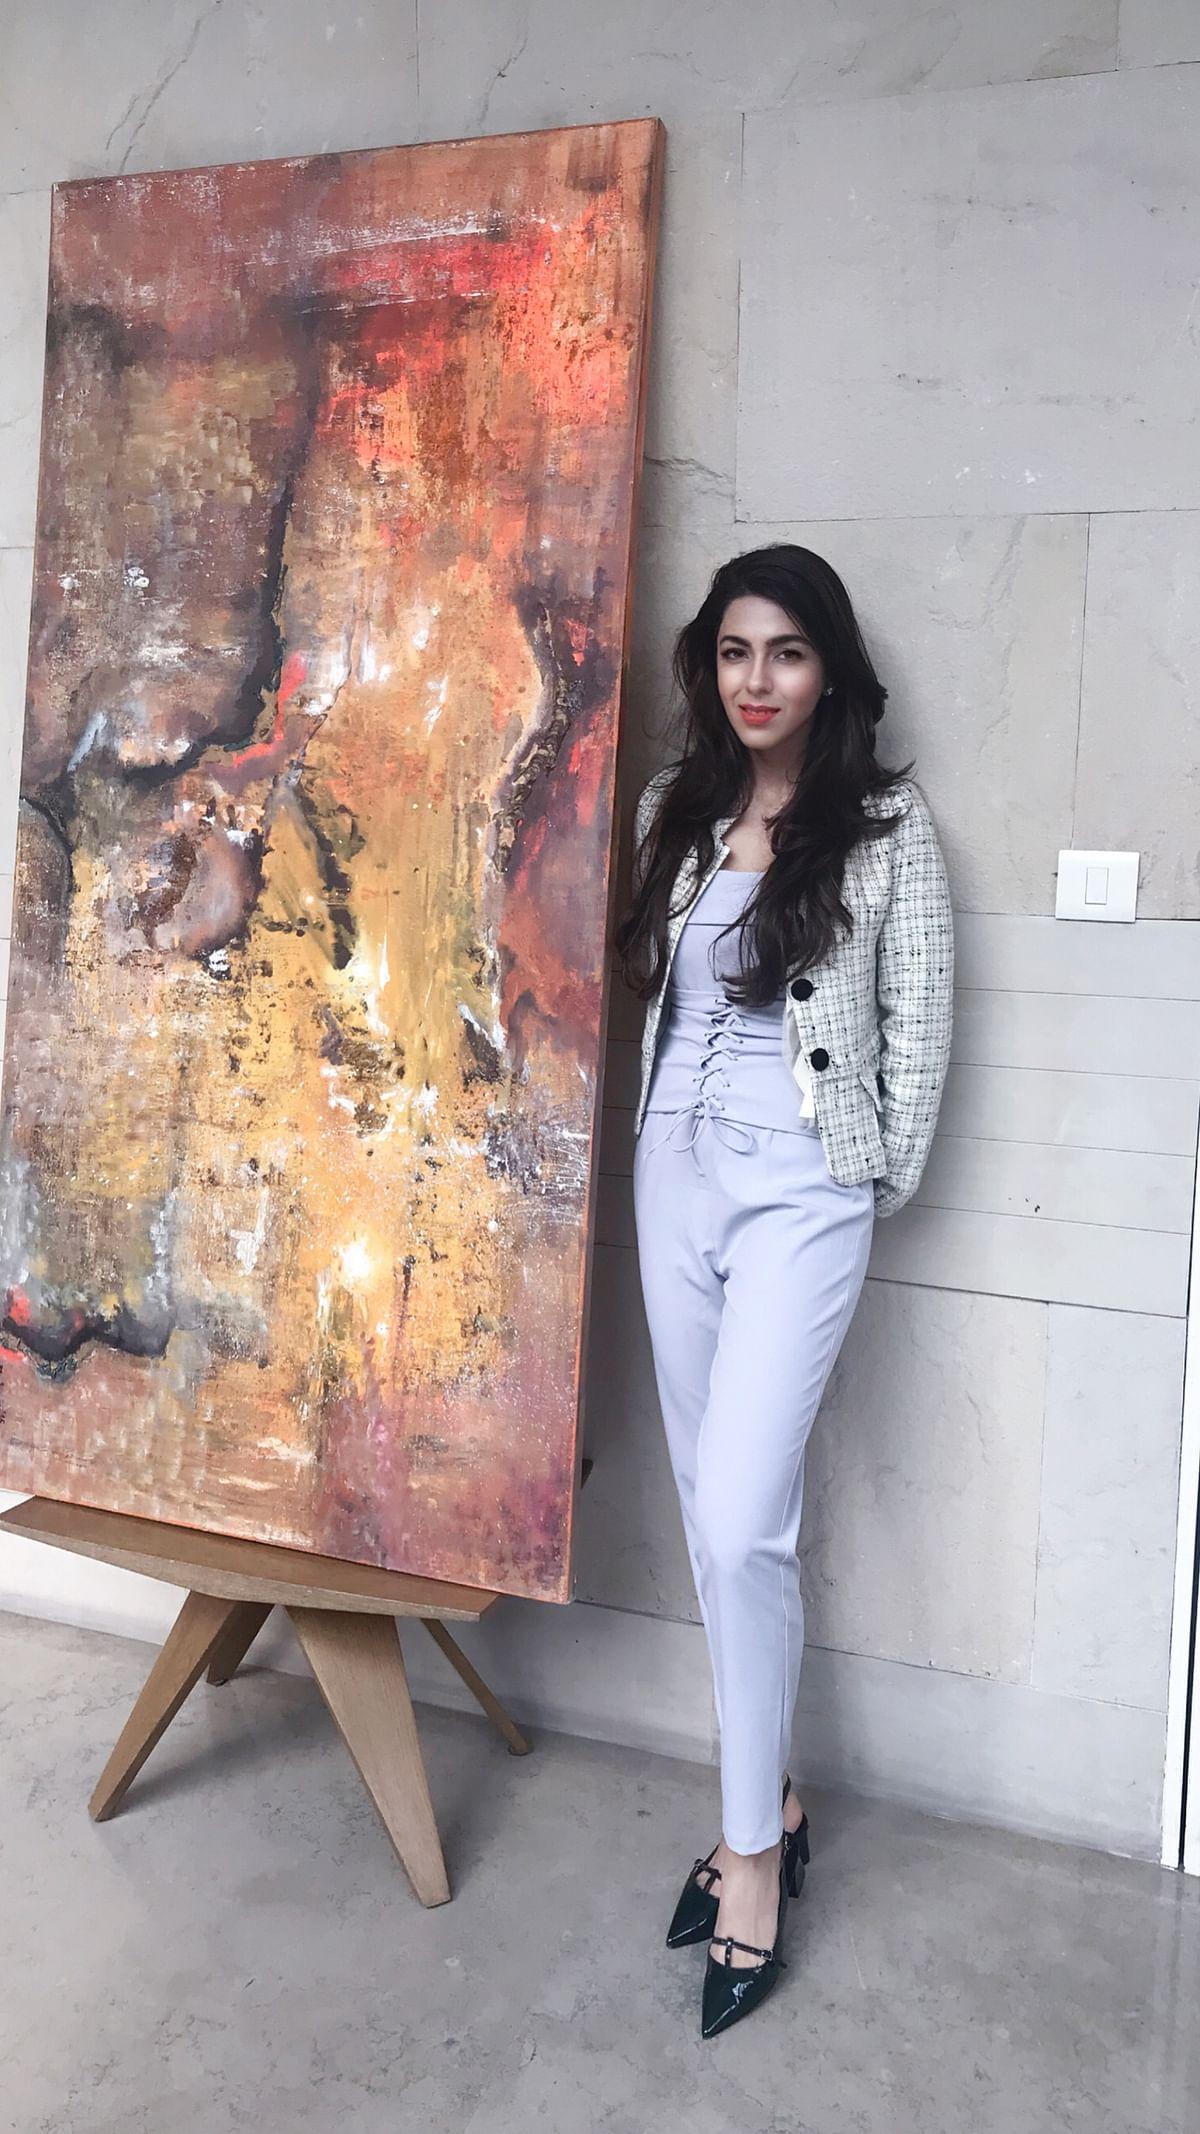 Bahaar Dhawan Rohtagi alongside one of her works